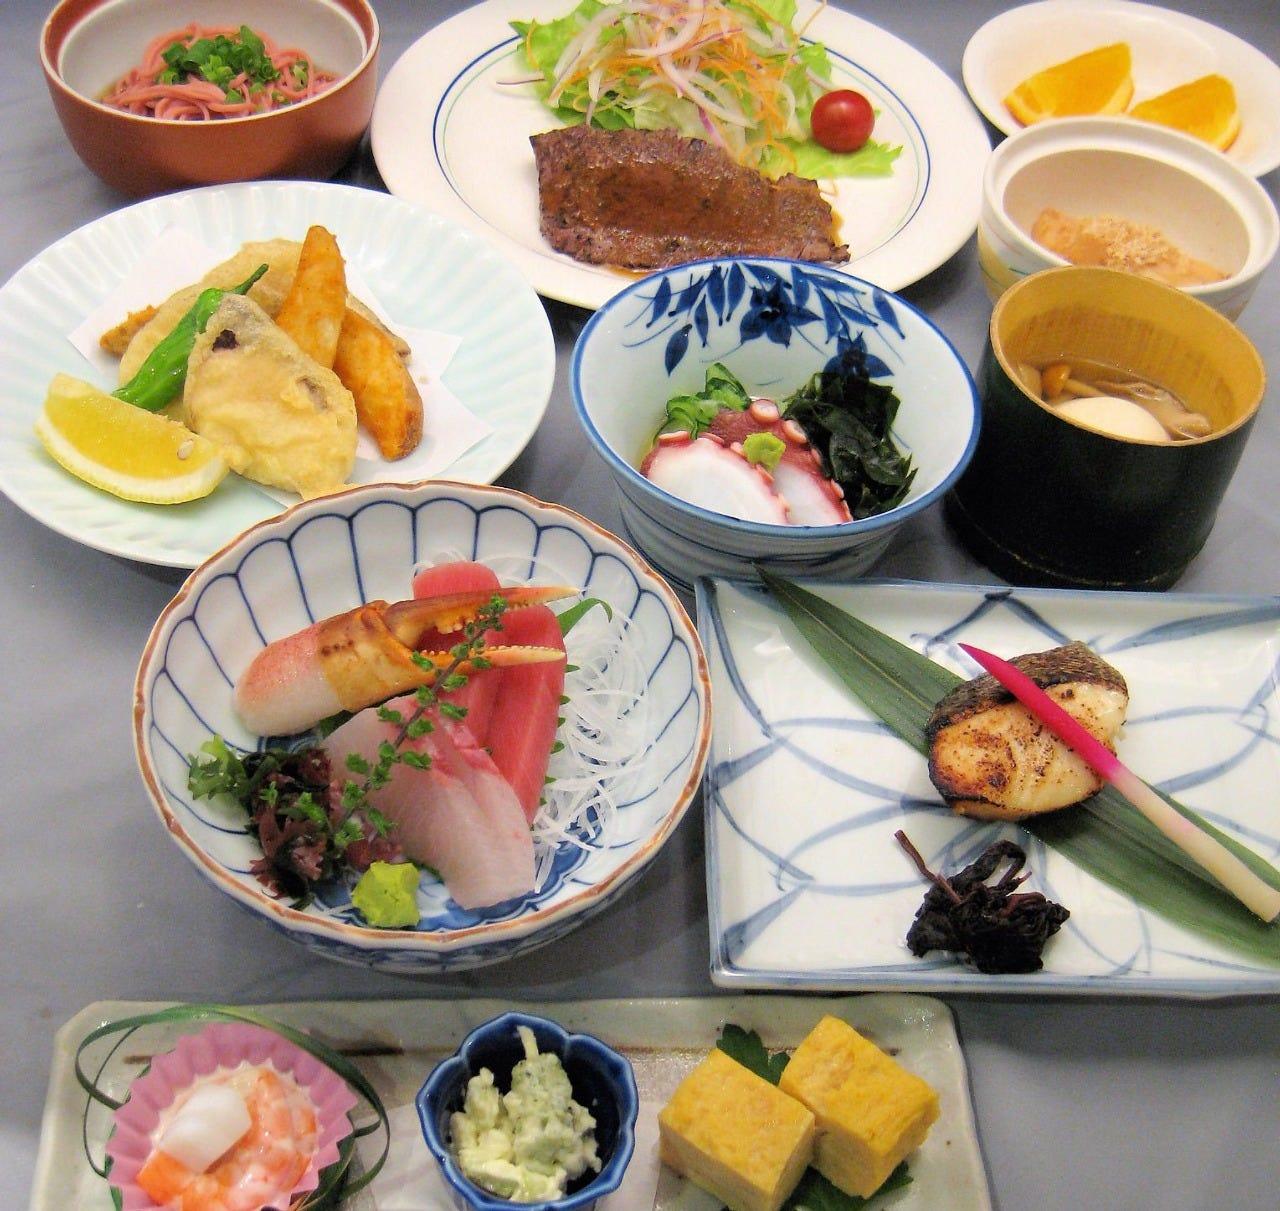 【豪華宴会】懐石7品+鍋コース 3時間飲み放題付 7500円(税込)各種ご宴会